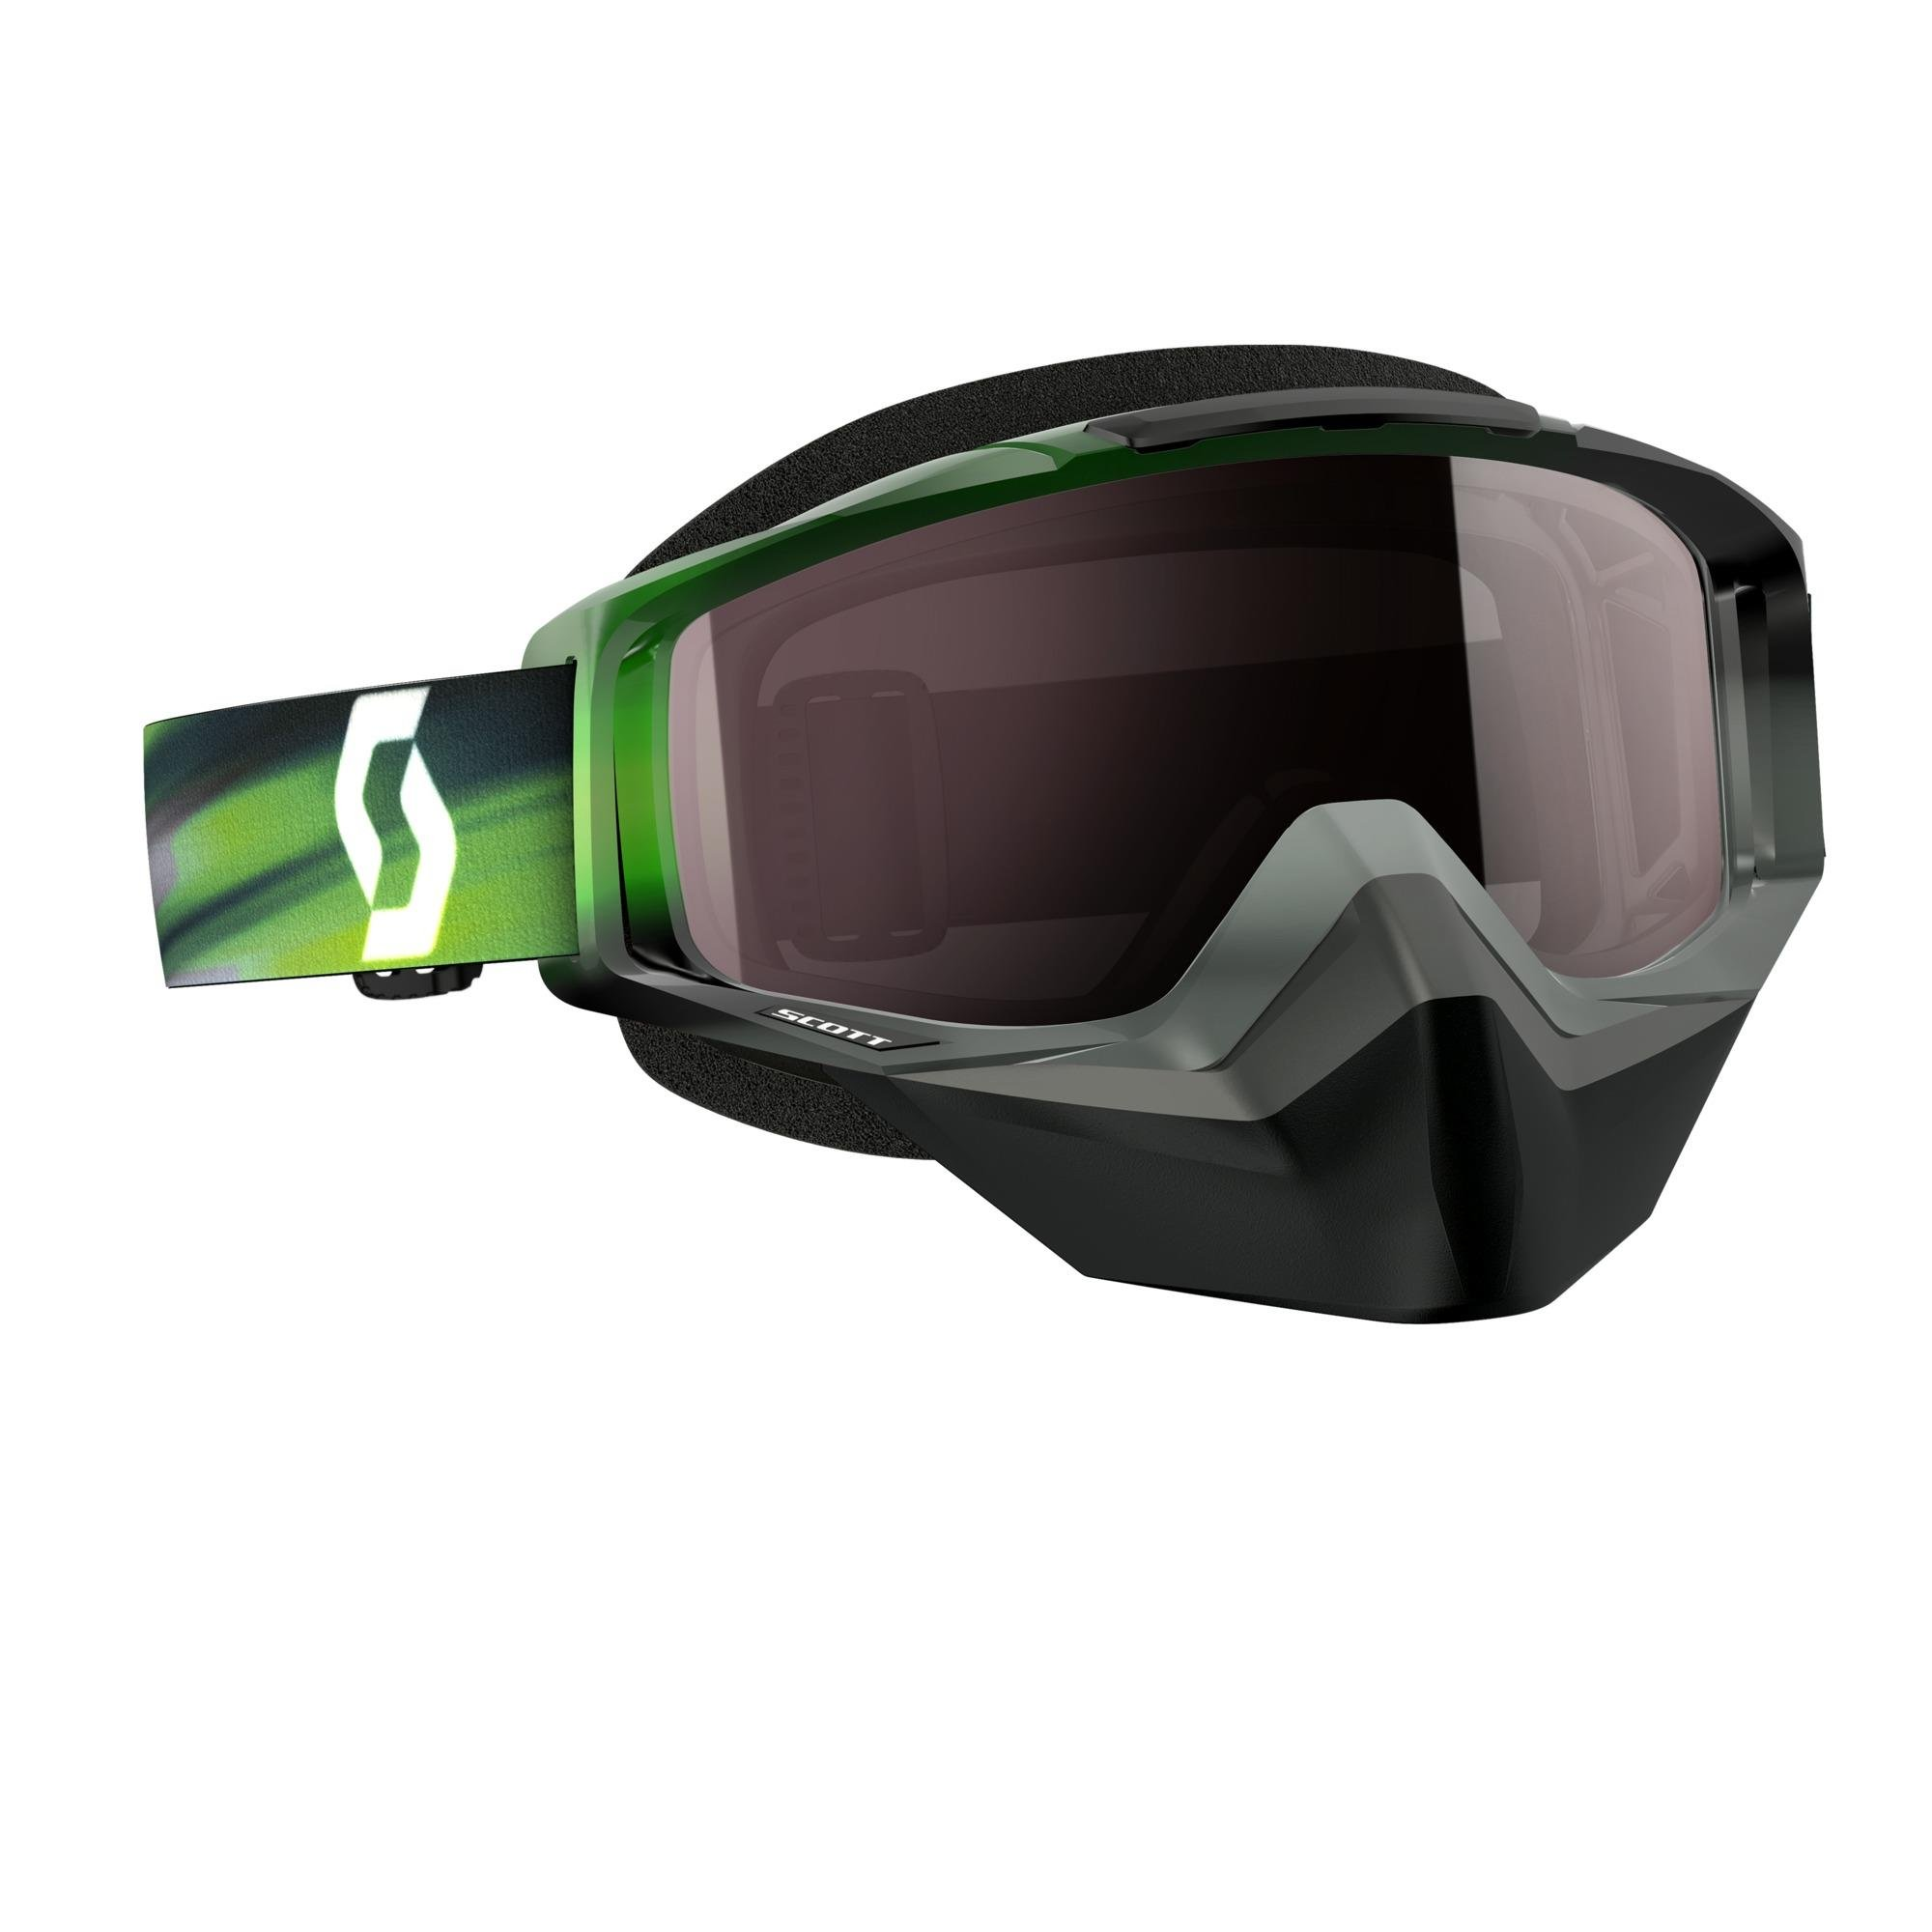 Scott Tyrant Men's Snocross Snowmobile Goggles Eyewear - Speed Grey/Green/Silver Chrome / One Size